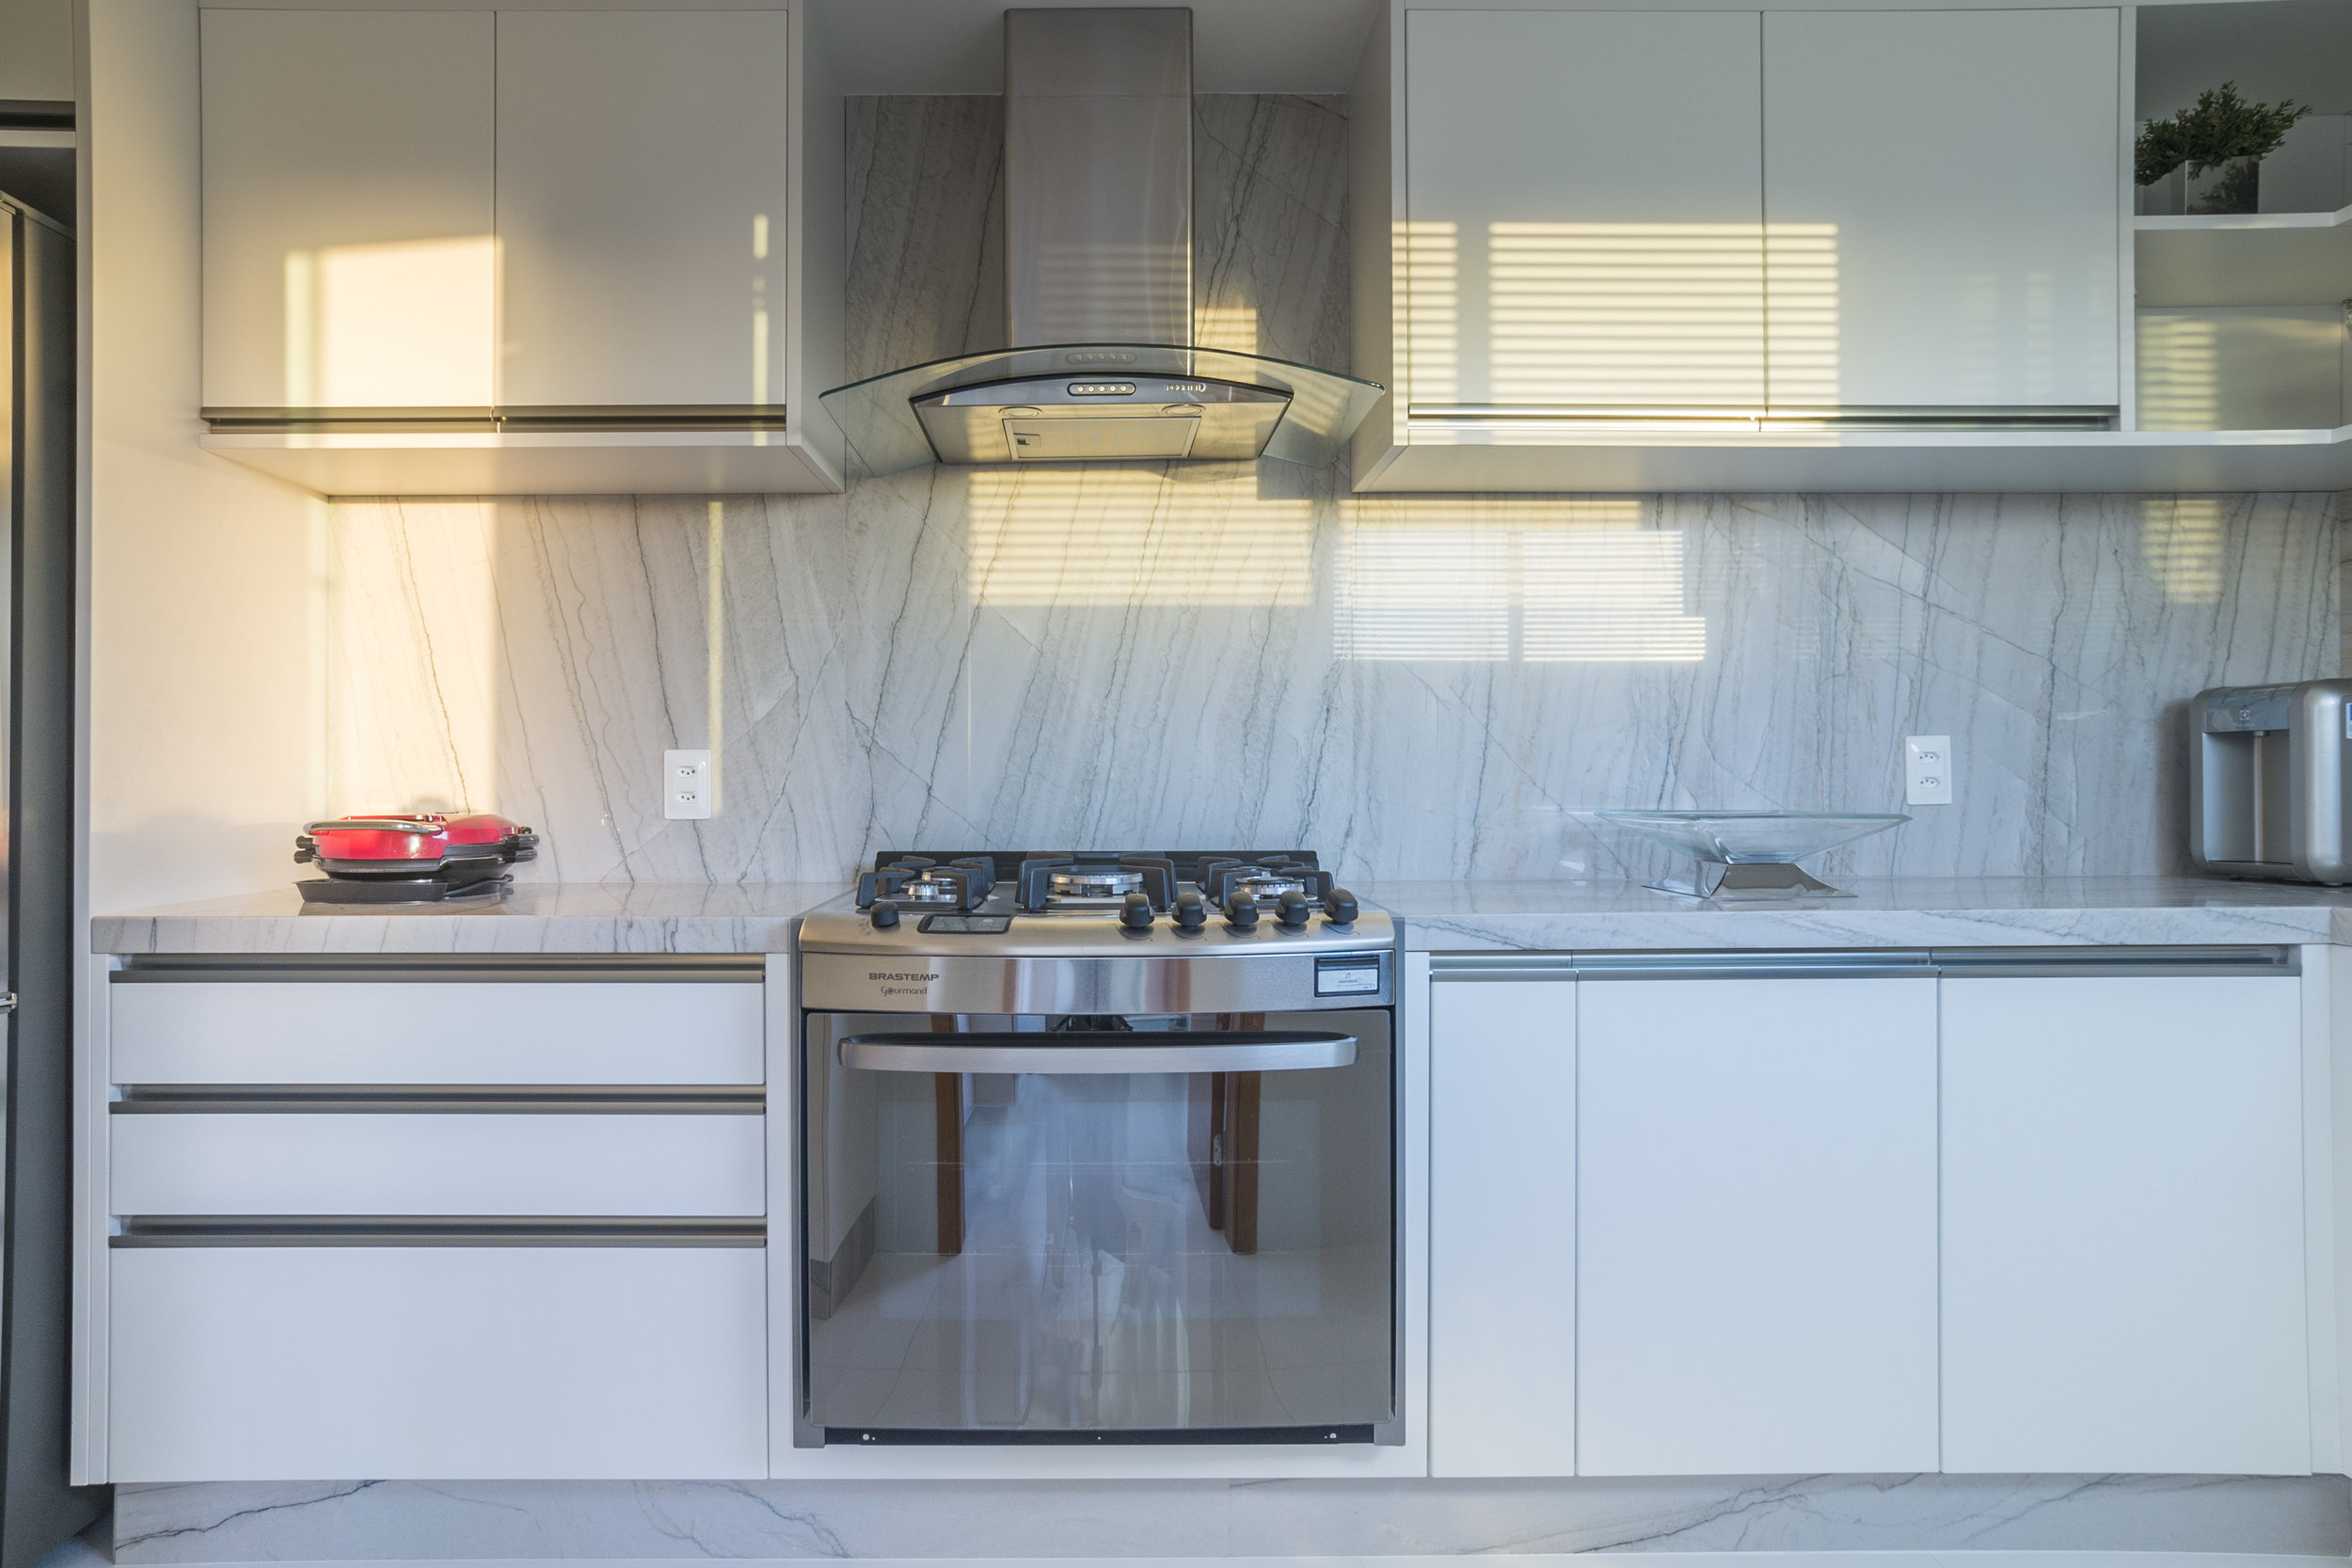 projeto-arquitetonico-robertoindira-duo-arquitetura-apartamentos-cozinha-02.jpg